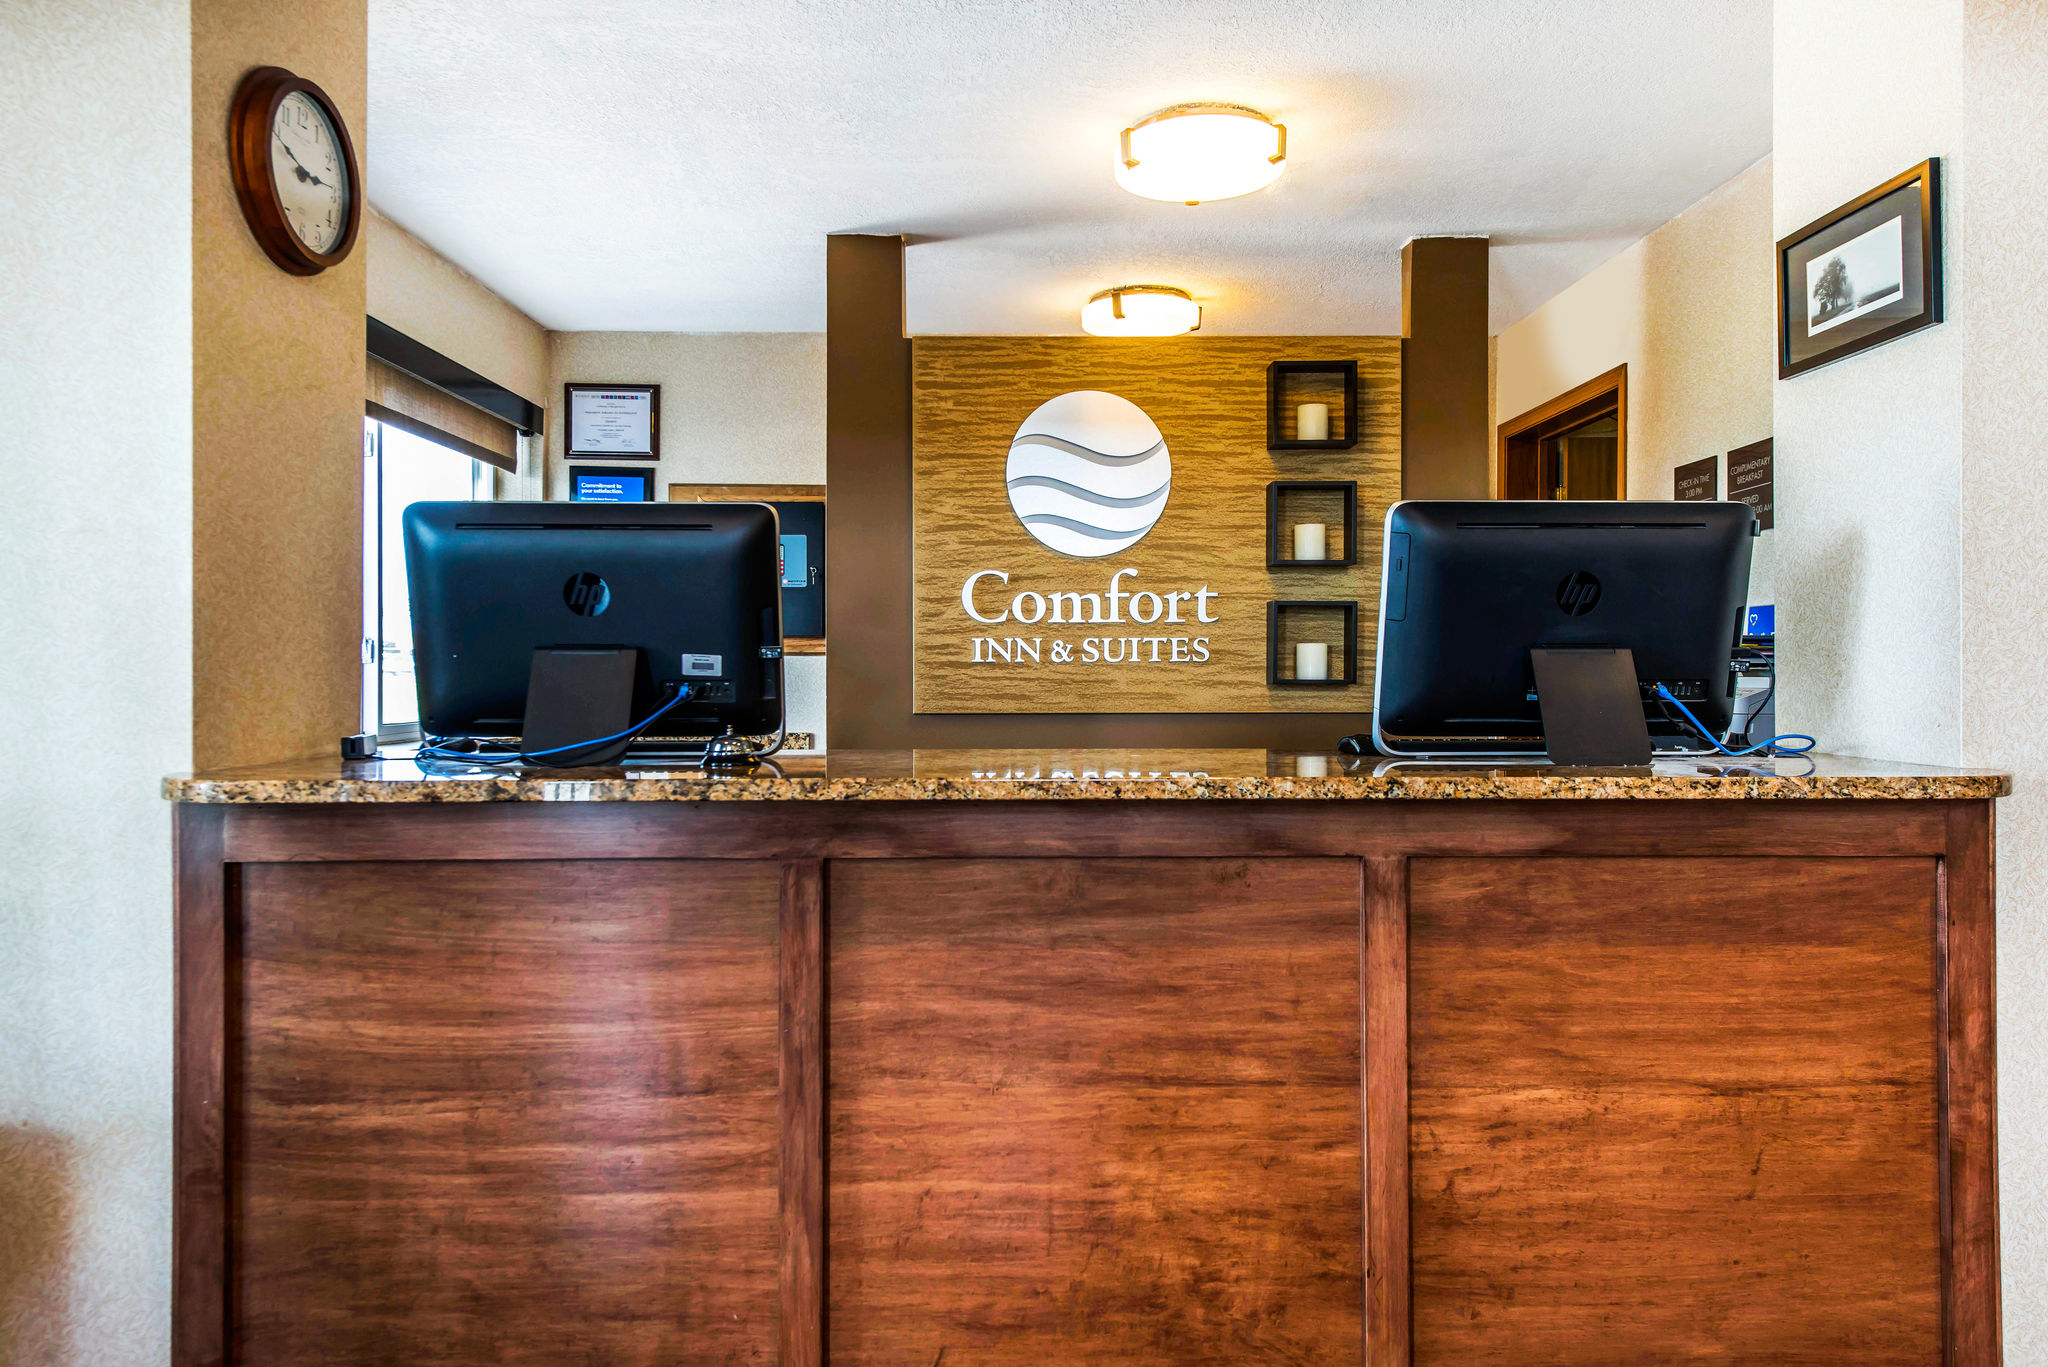 Comfort Inn Amp Suites North In Hays Ks Whitepages